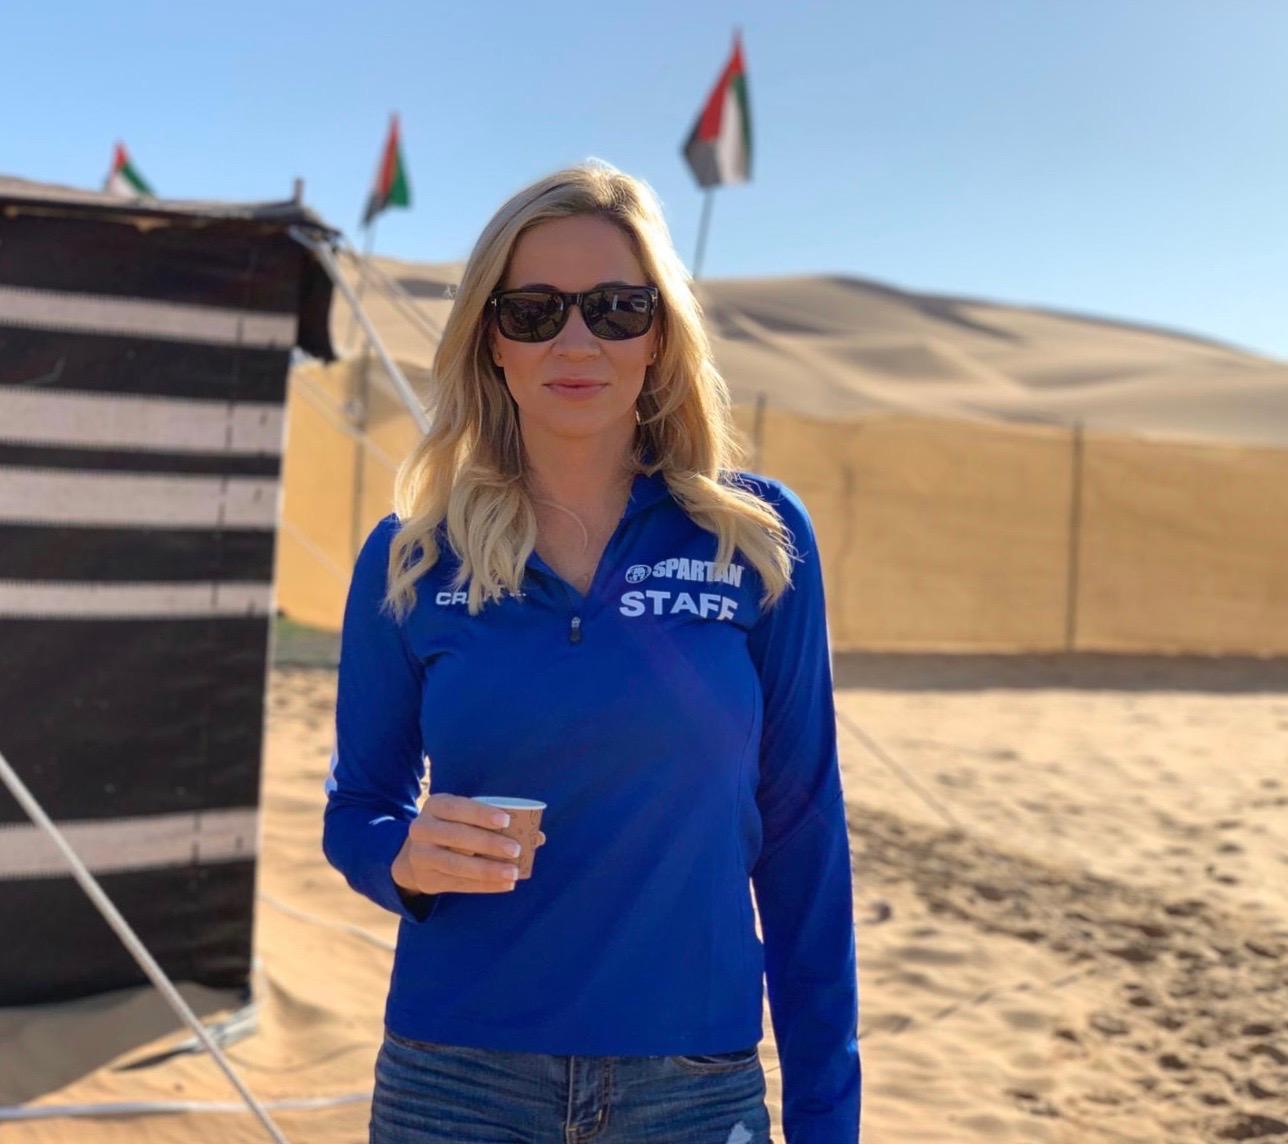 Abu Dhabi Spartan Cherie Bortnick